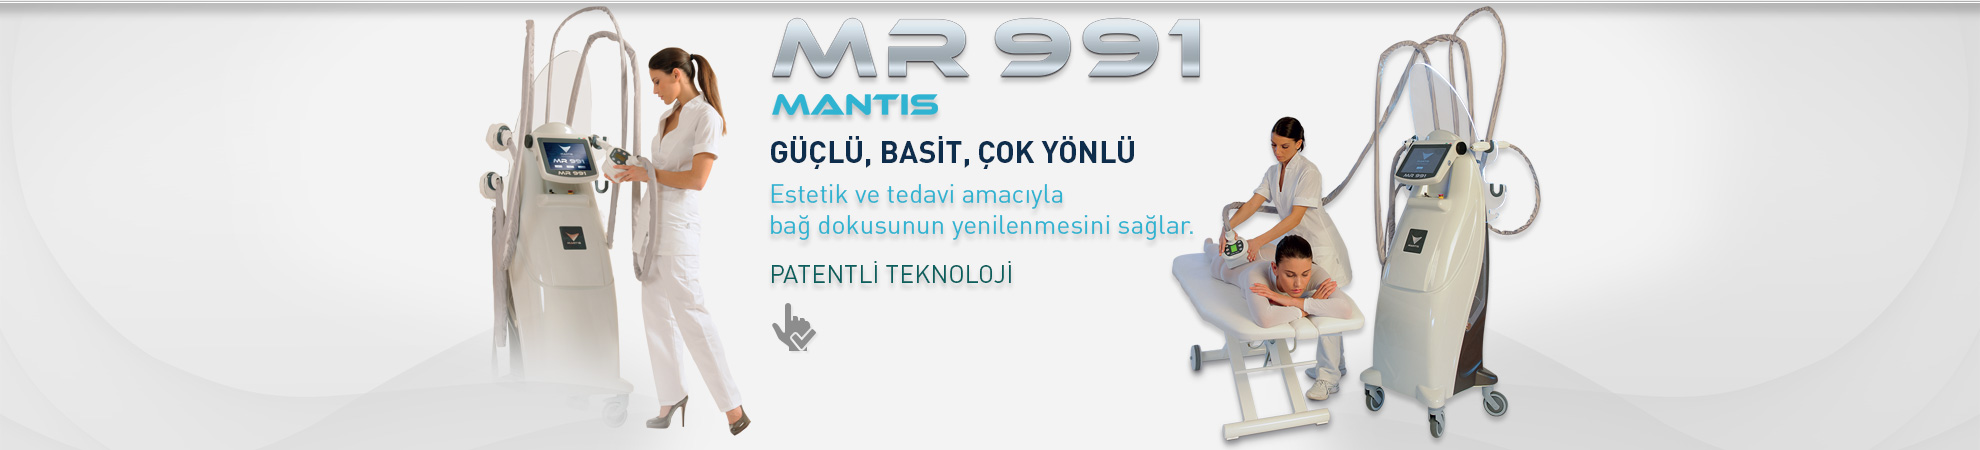 mantis-mr991